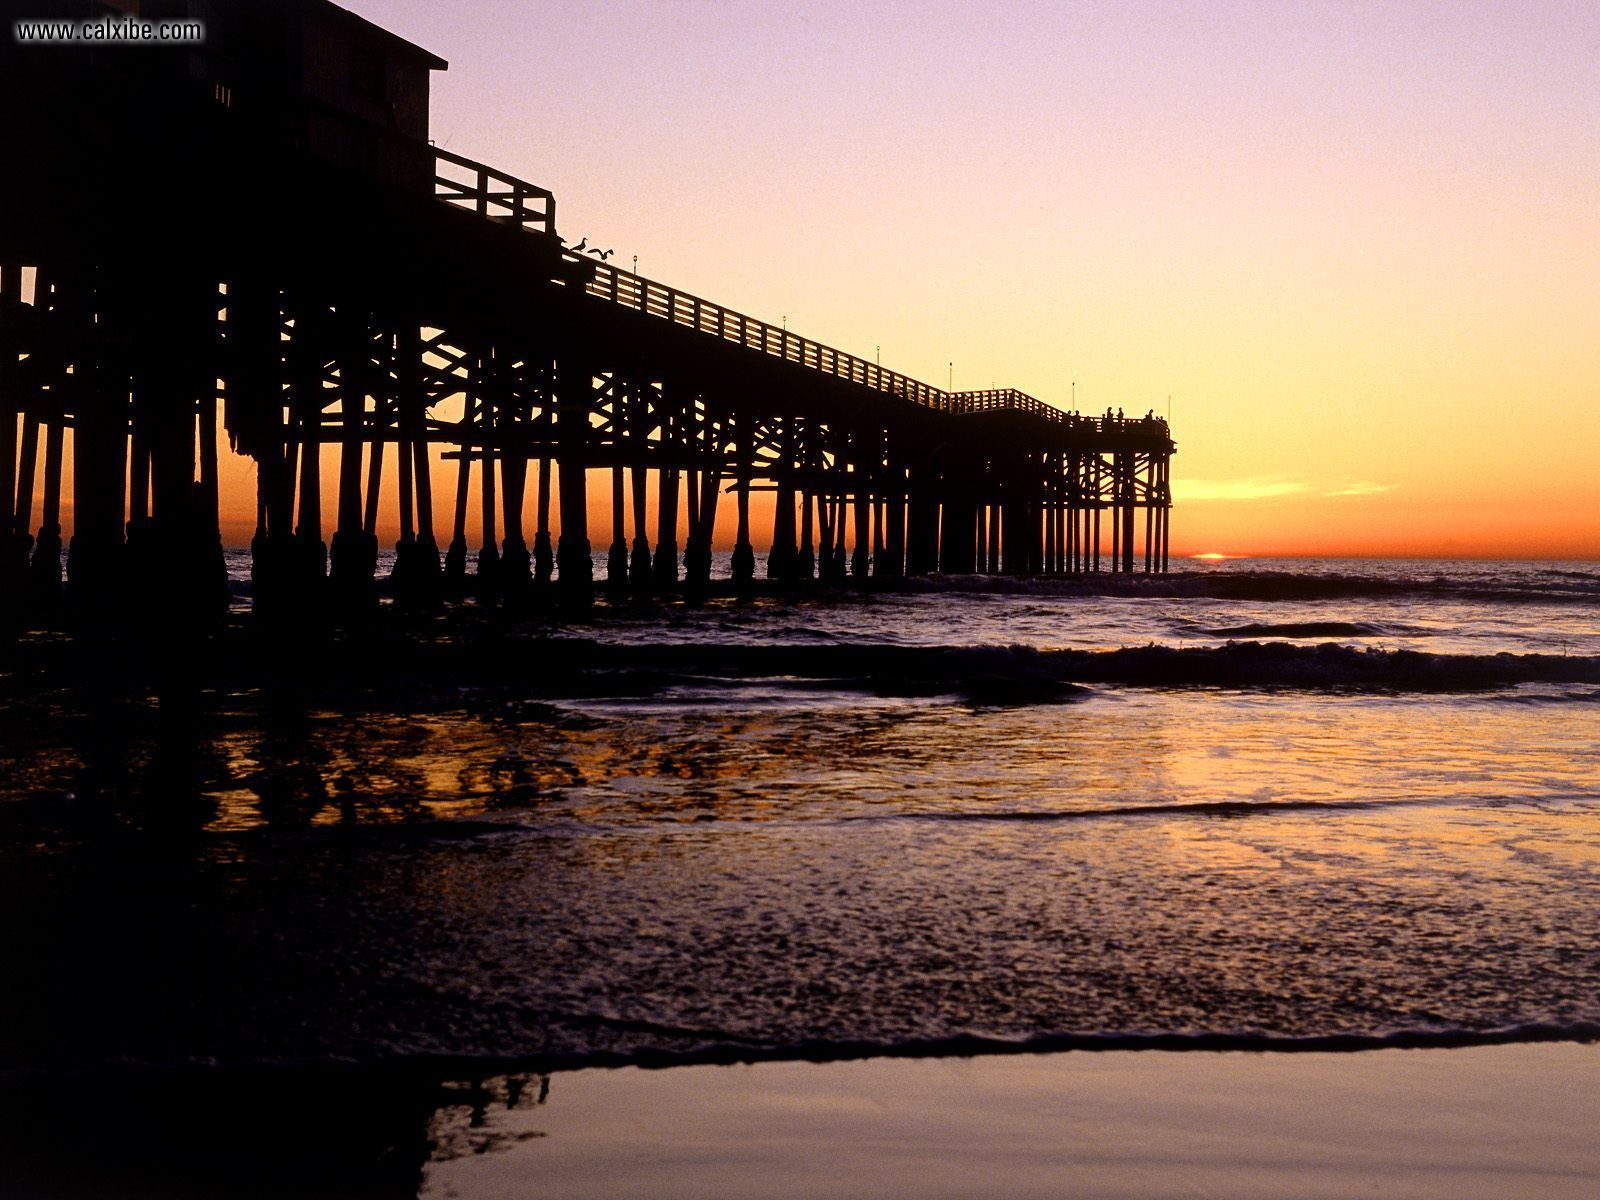 Register San Diego California San Diego Beach Hotels San Diego Pier